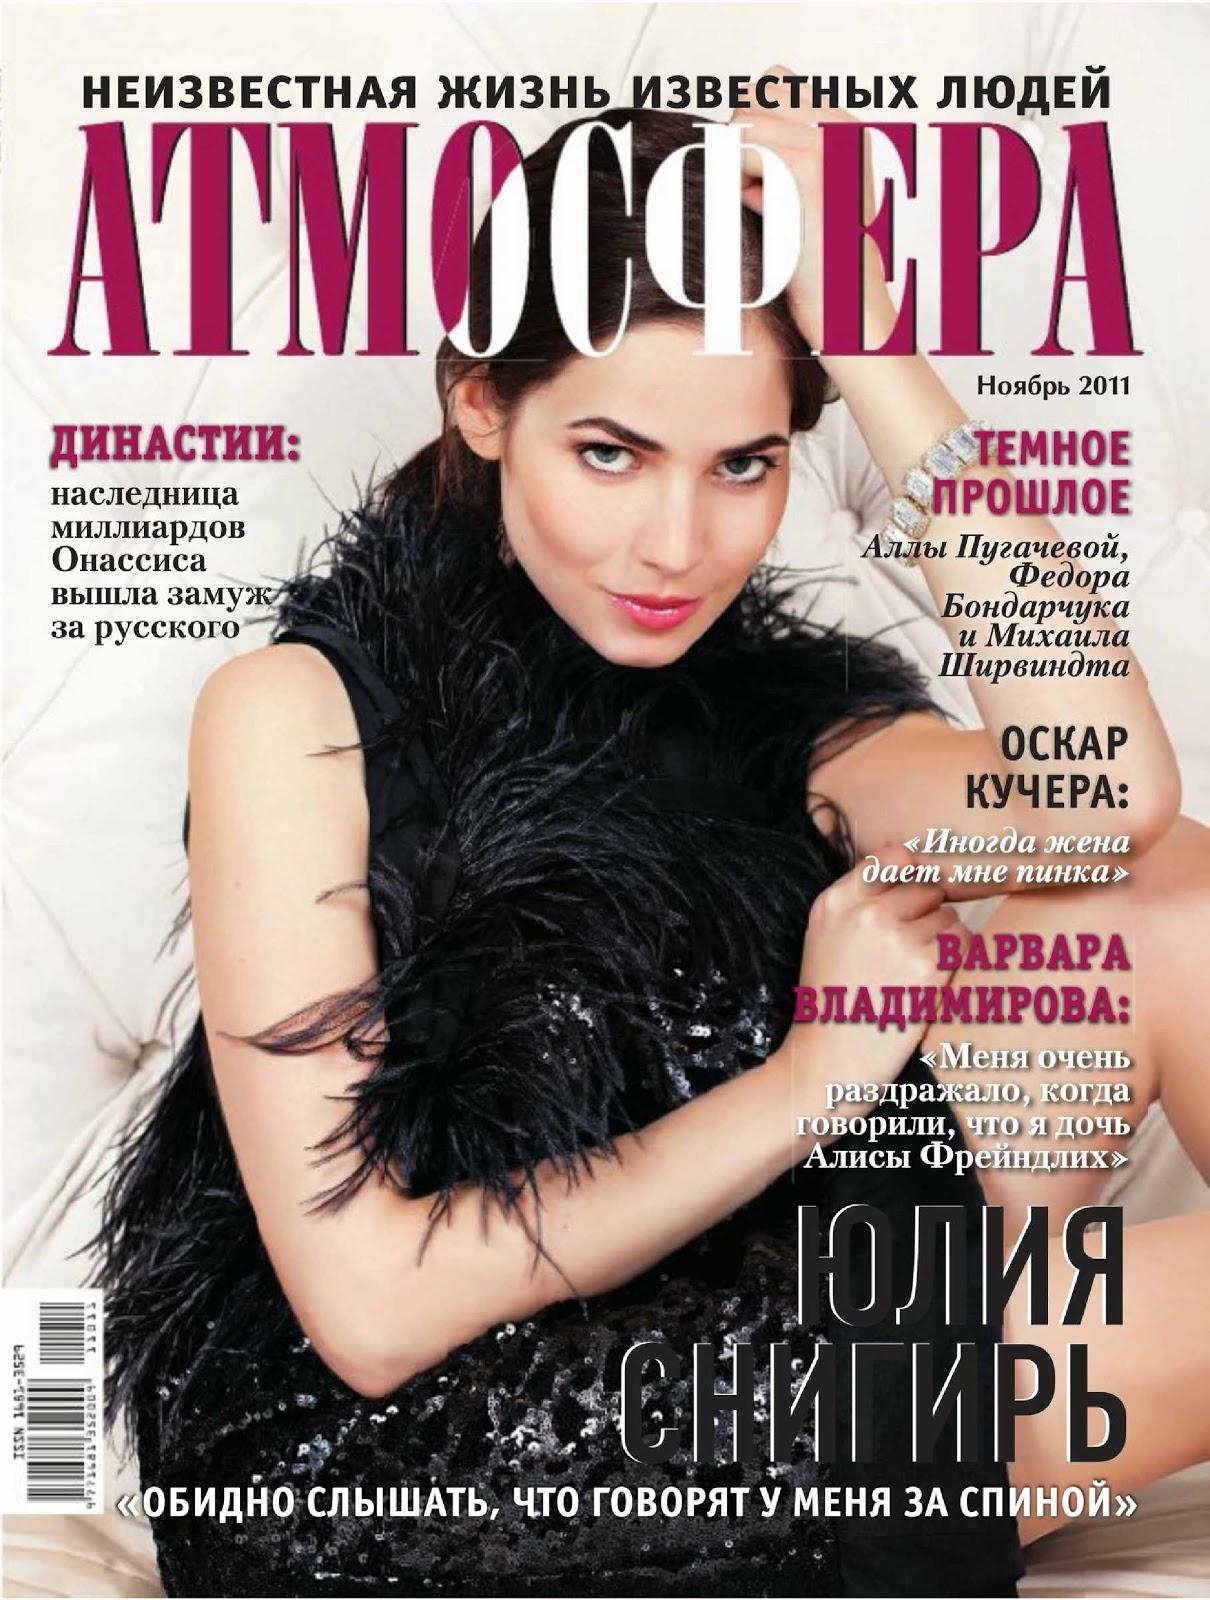 Юлия зимина фото в журнале 4 фотография